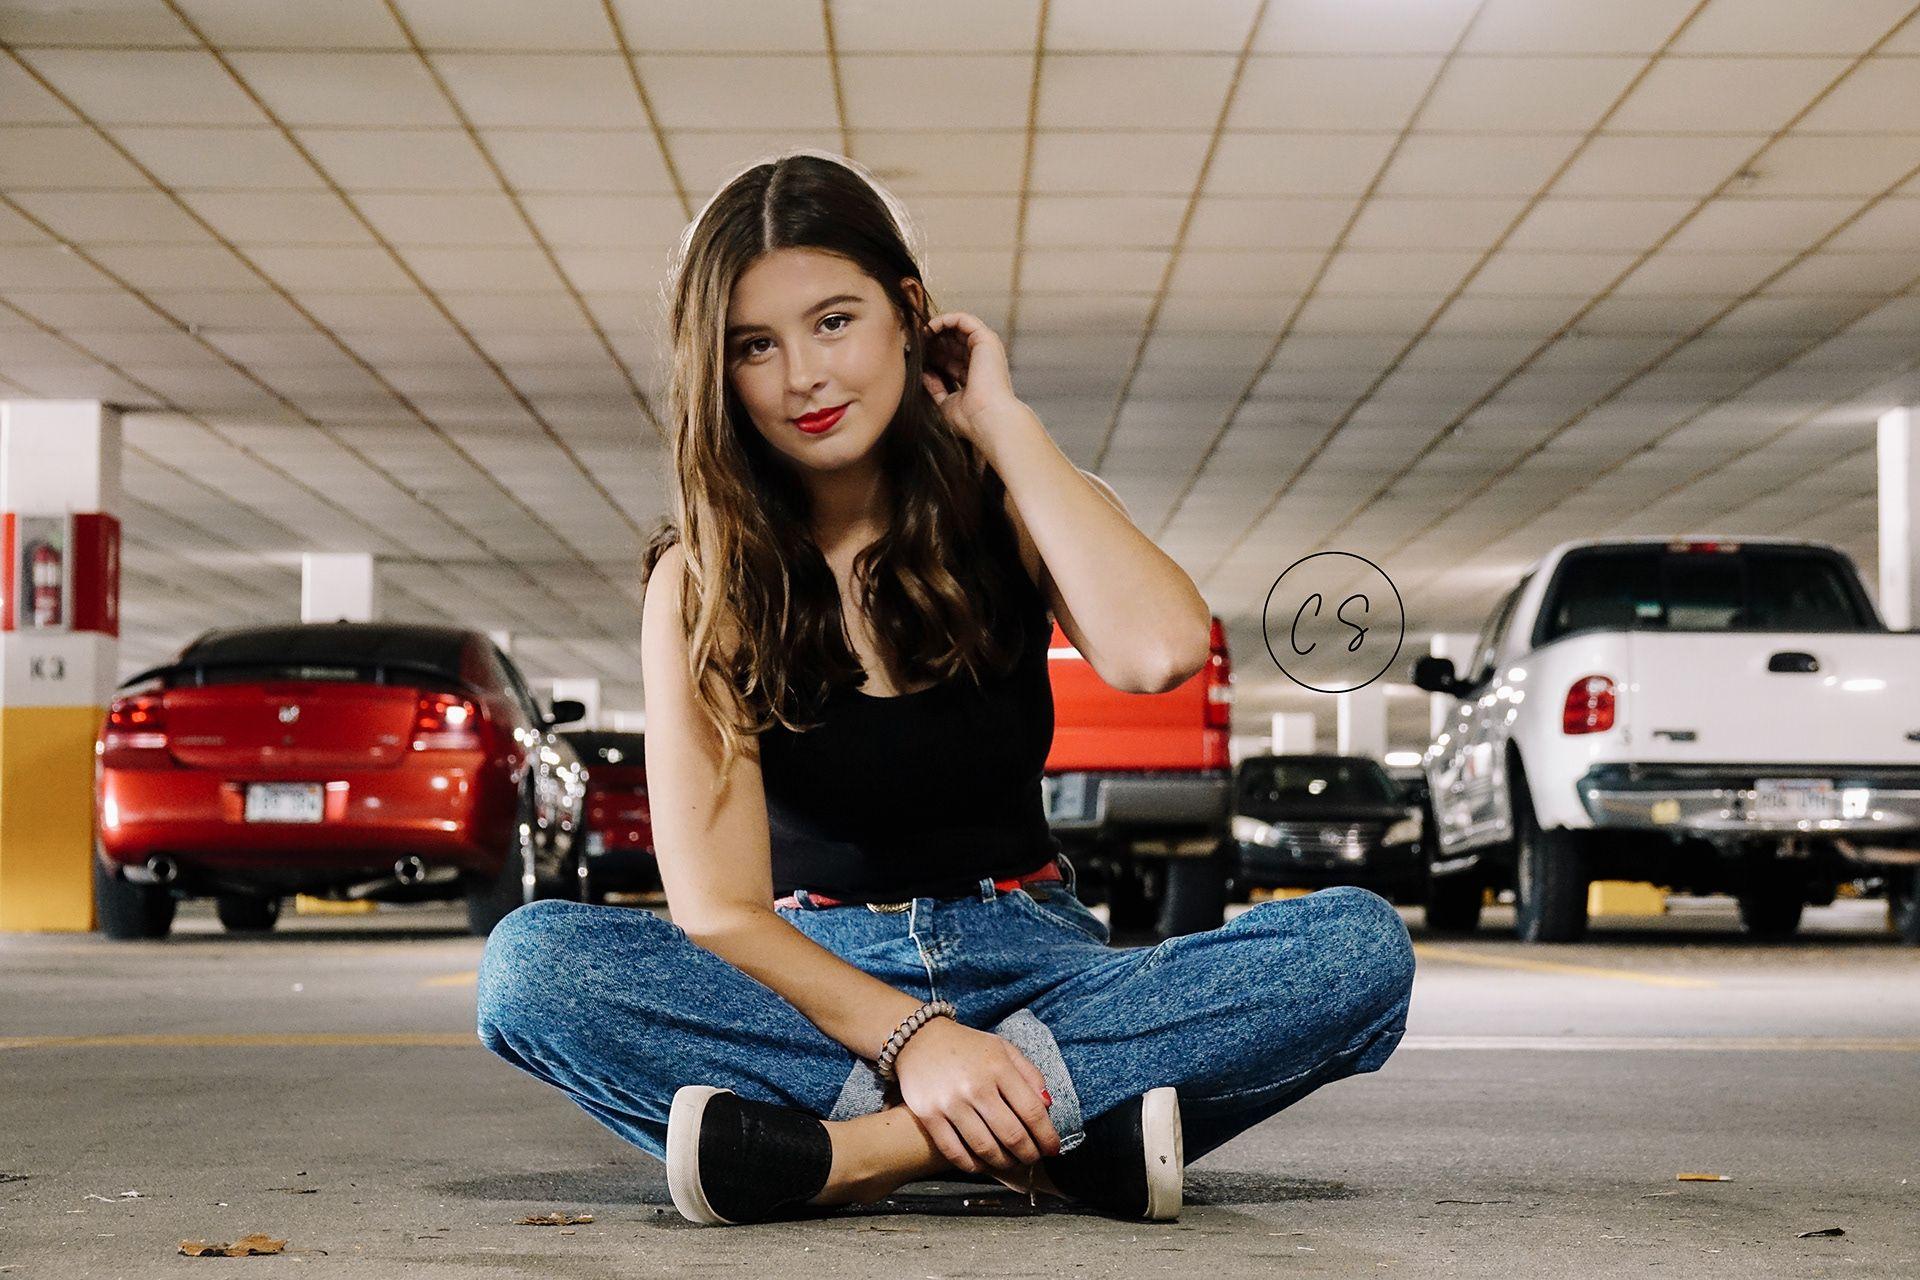 Parking lot photoshoot